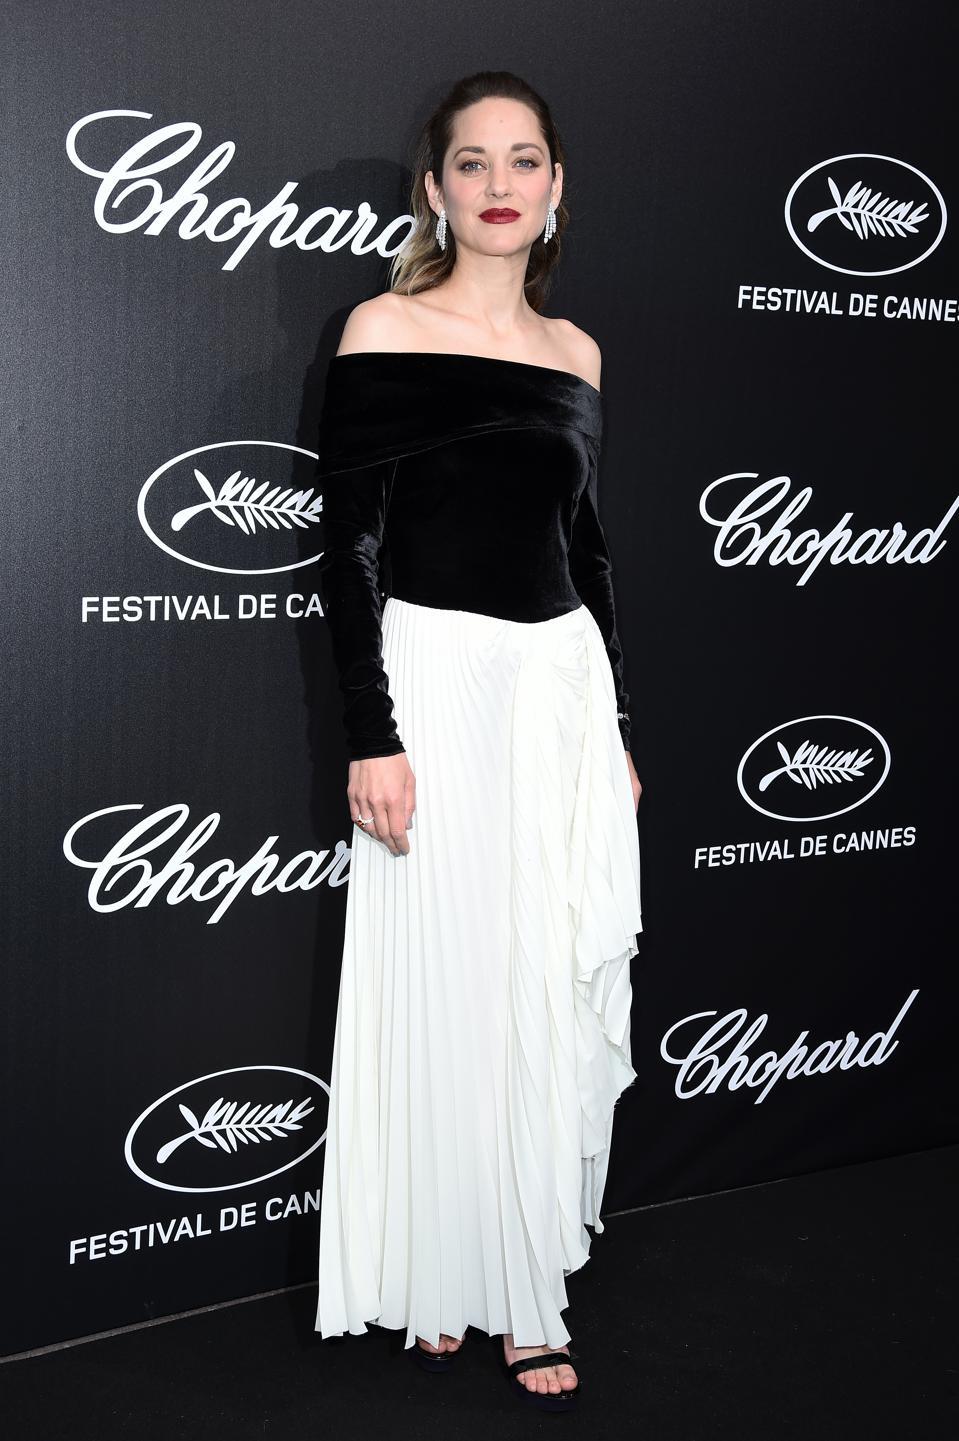 Cannes Film Festival Chopard Dinner Marion Cotillard